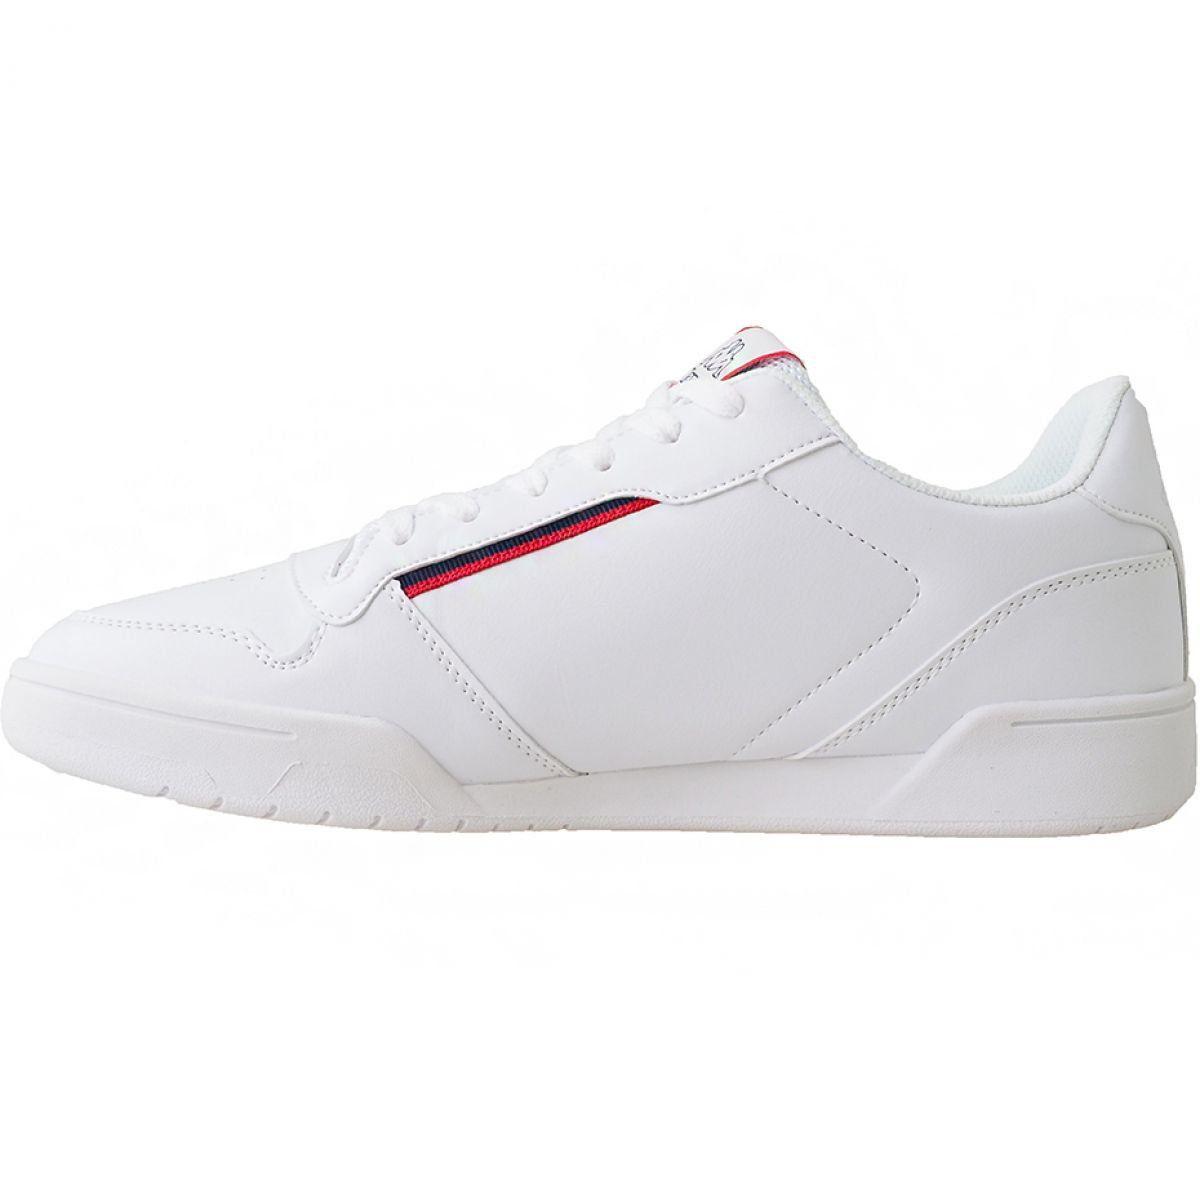 Sports Men S Kappa Kappa Marabu M 242765 1020 Shoes White Shoes Classic Sneakers Sneakers